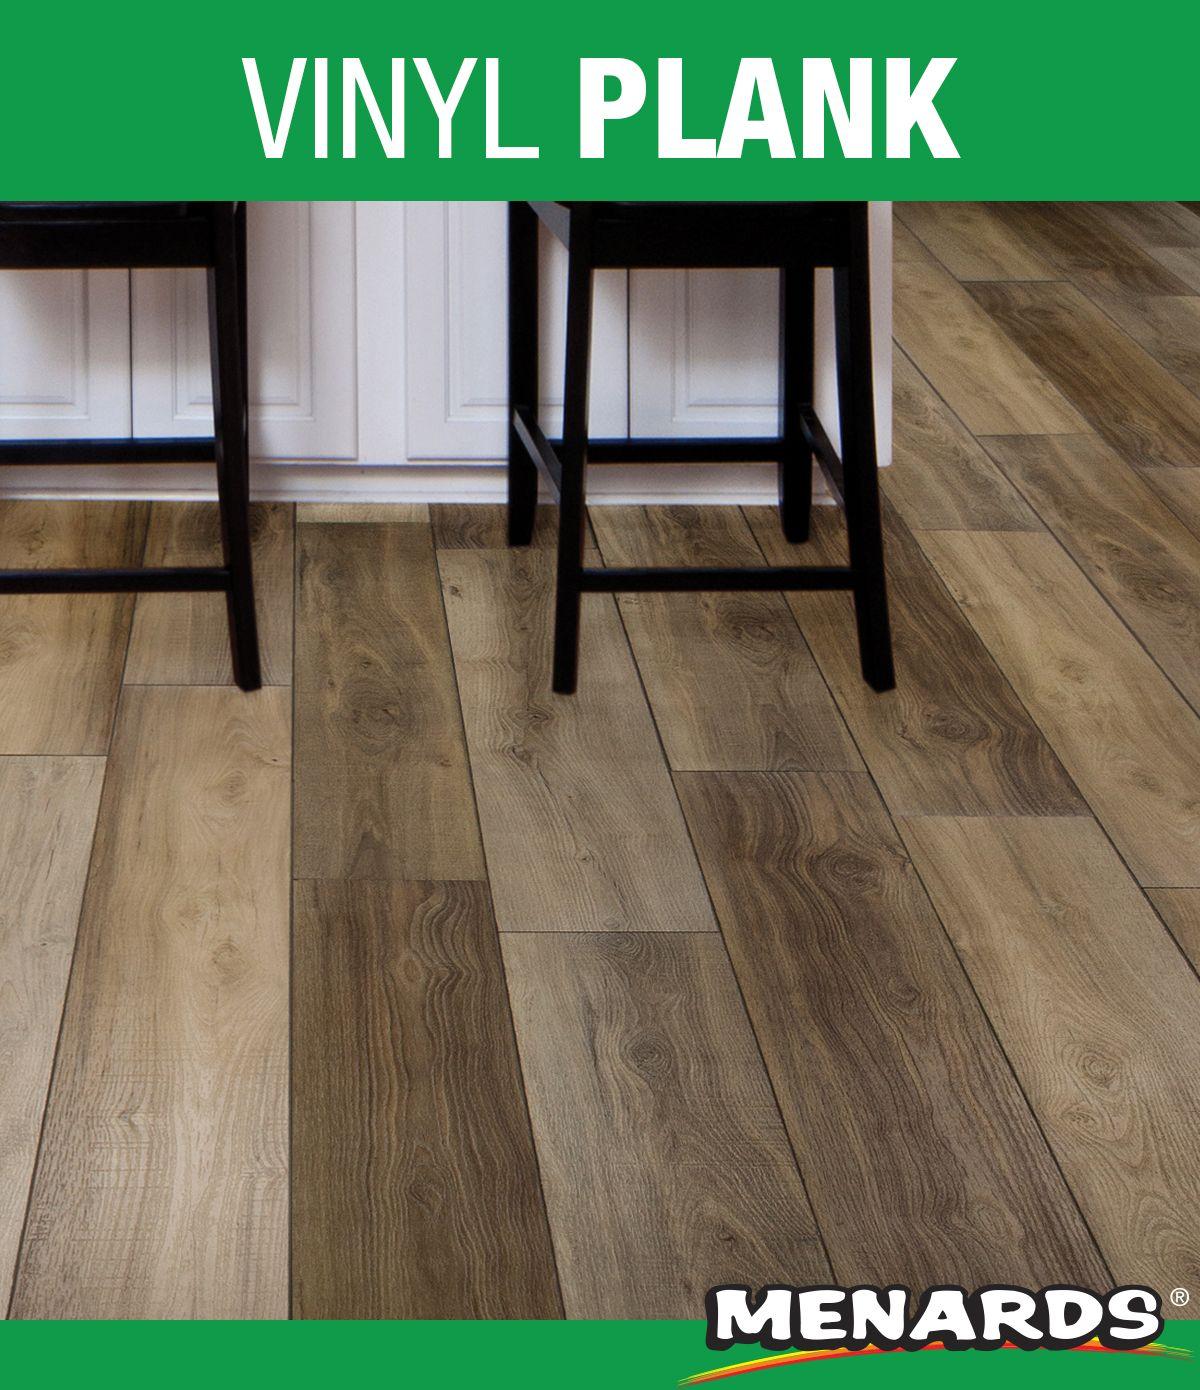 SuperFast® BayRock vinyl planks feature a unique rigid